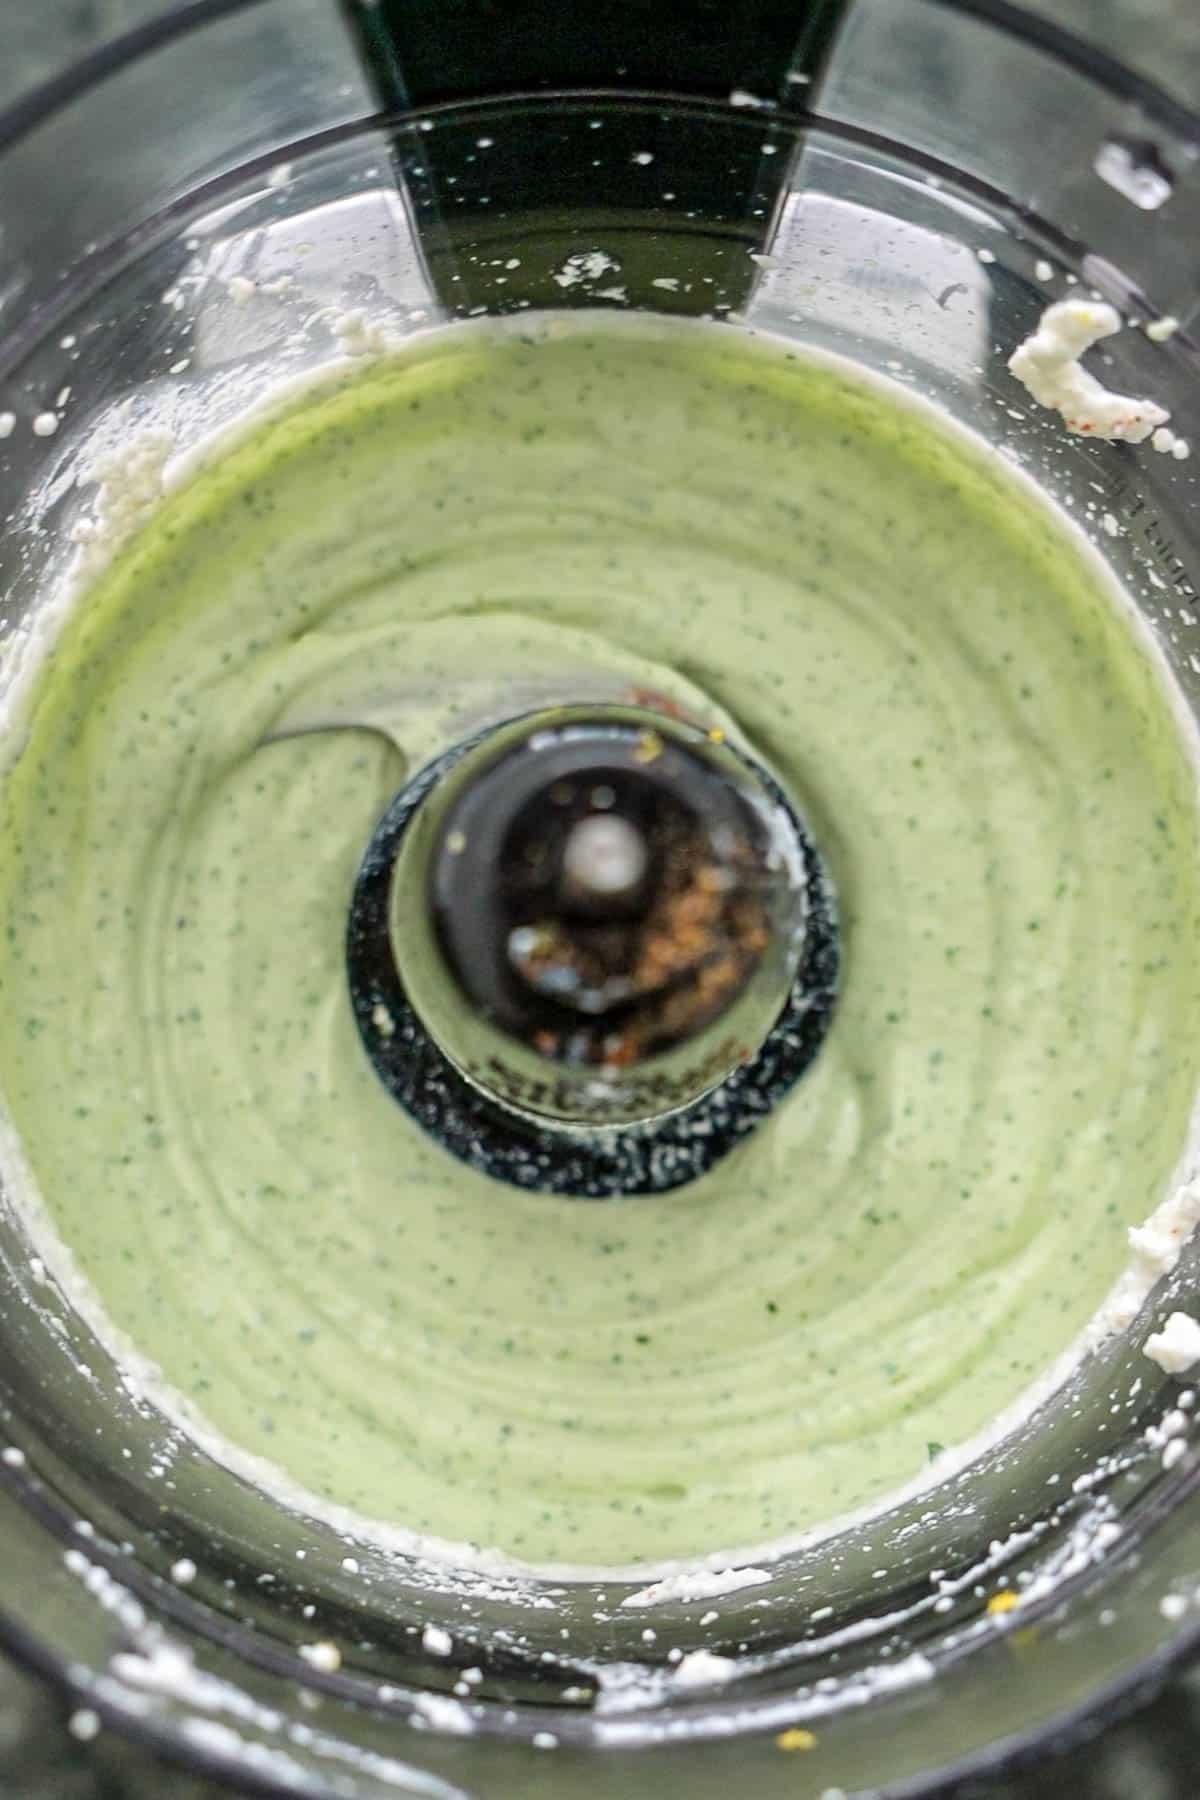 Lemon Basil Whipped Ricotta in a food processor